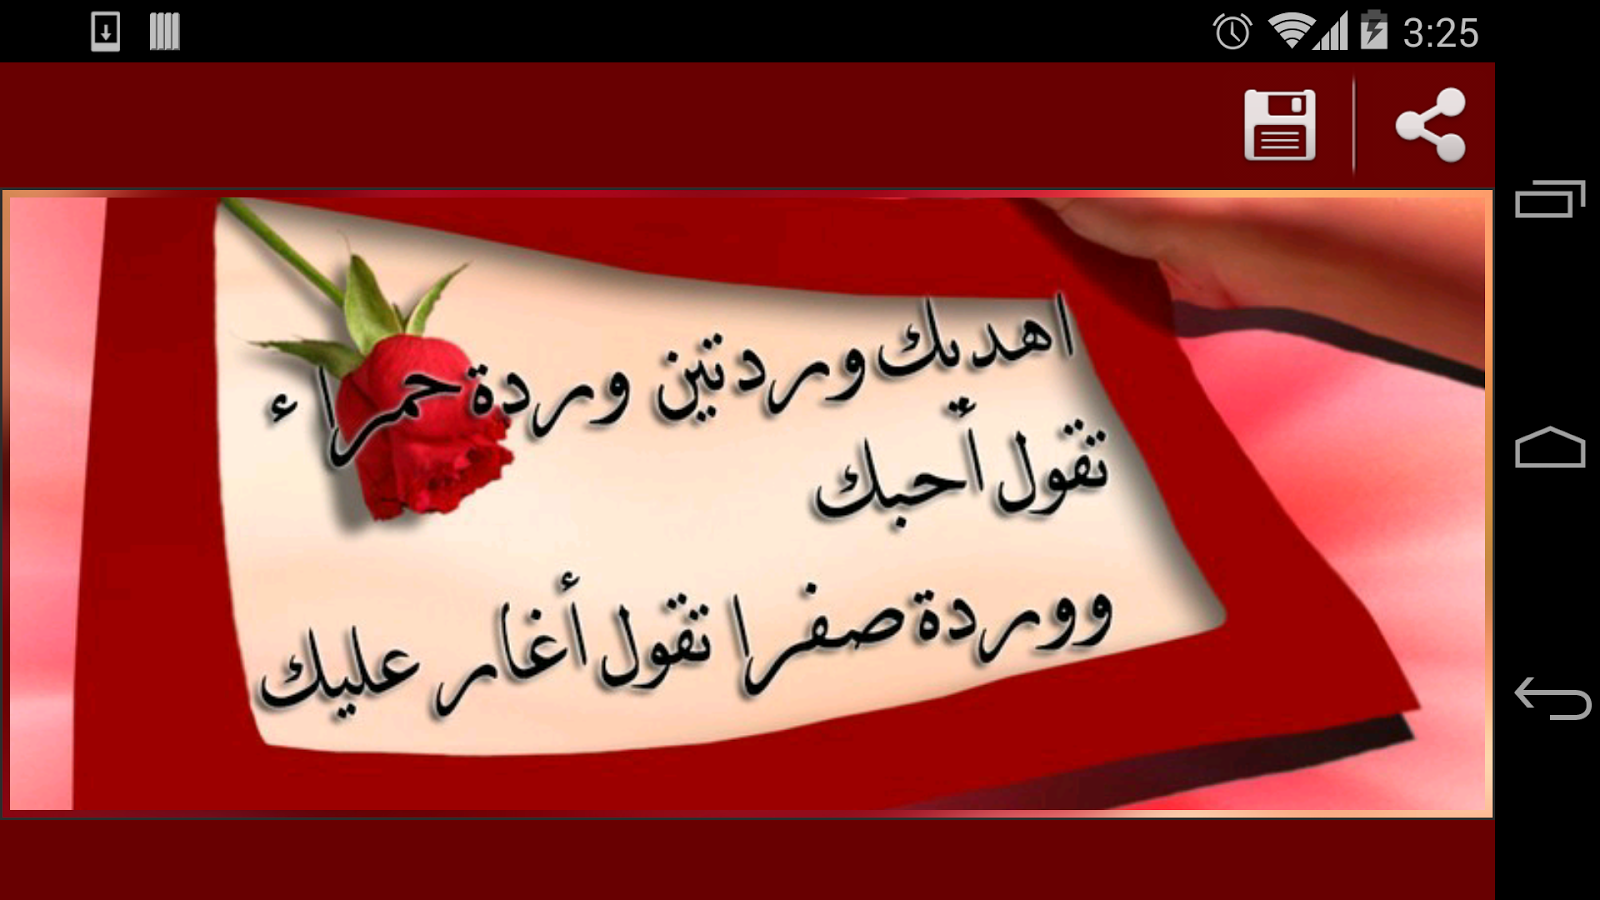 بالصور صور رسائل حب , اجمل مسجات حب وعشق 5028 1